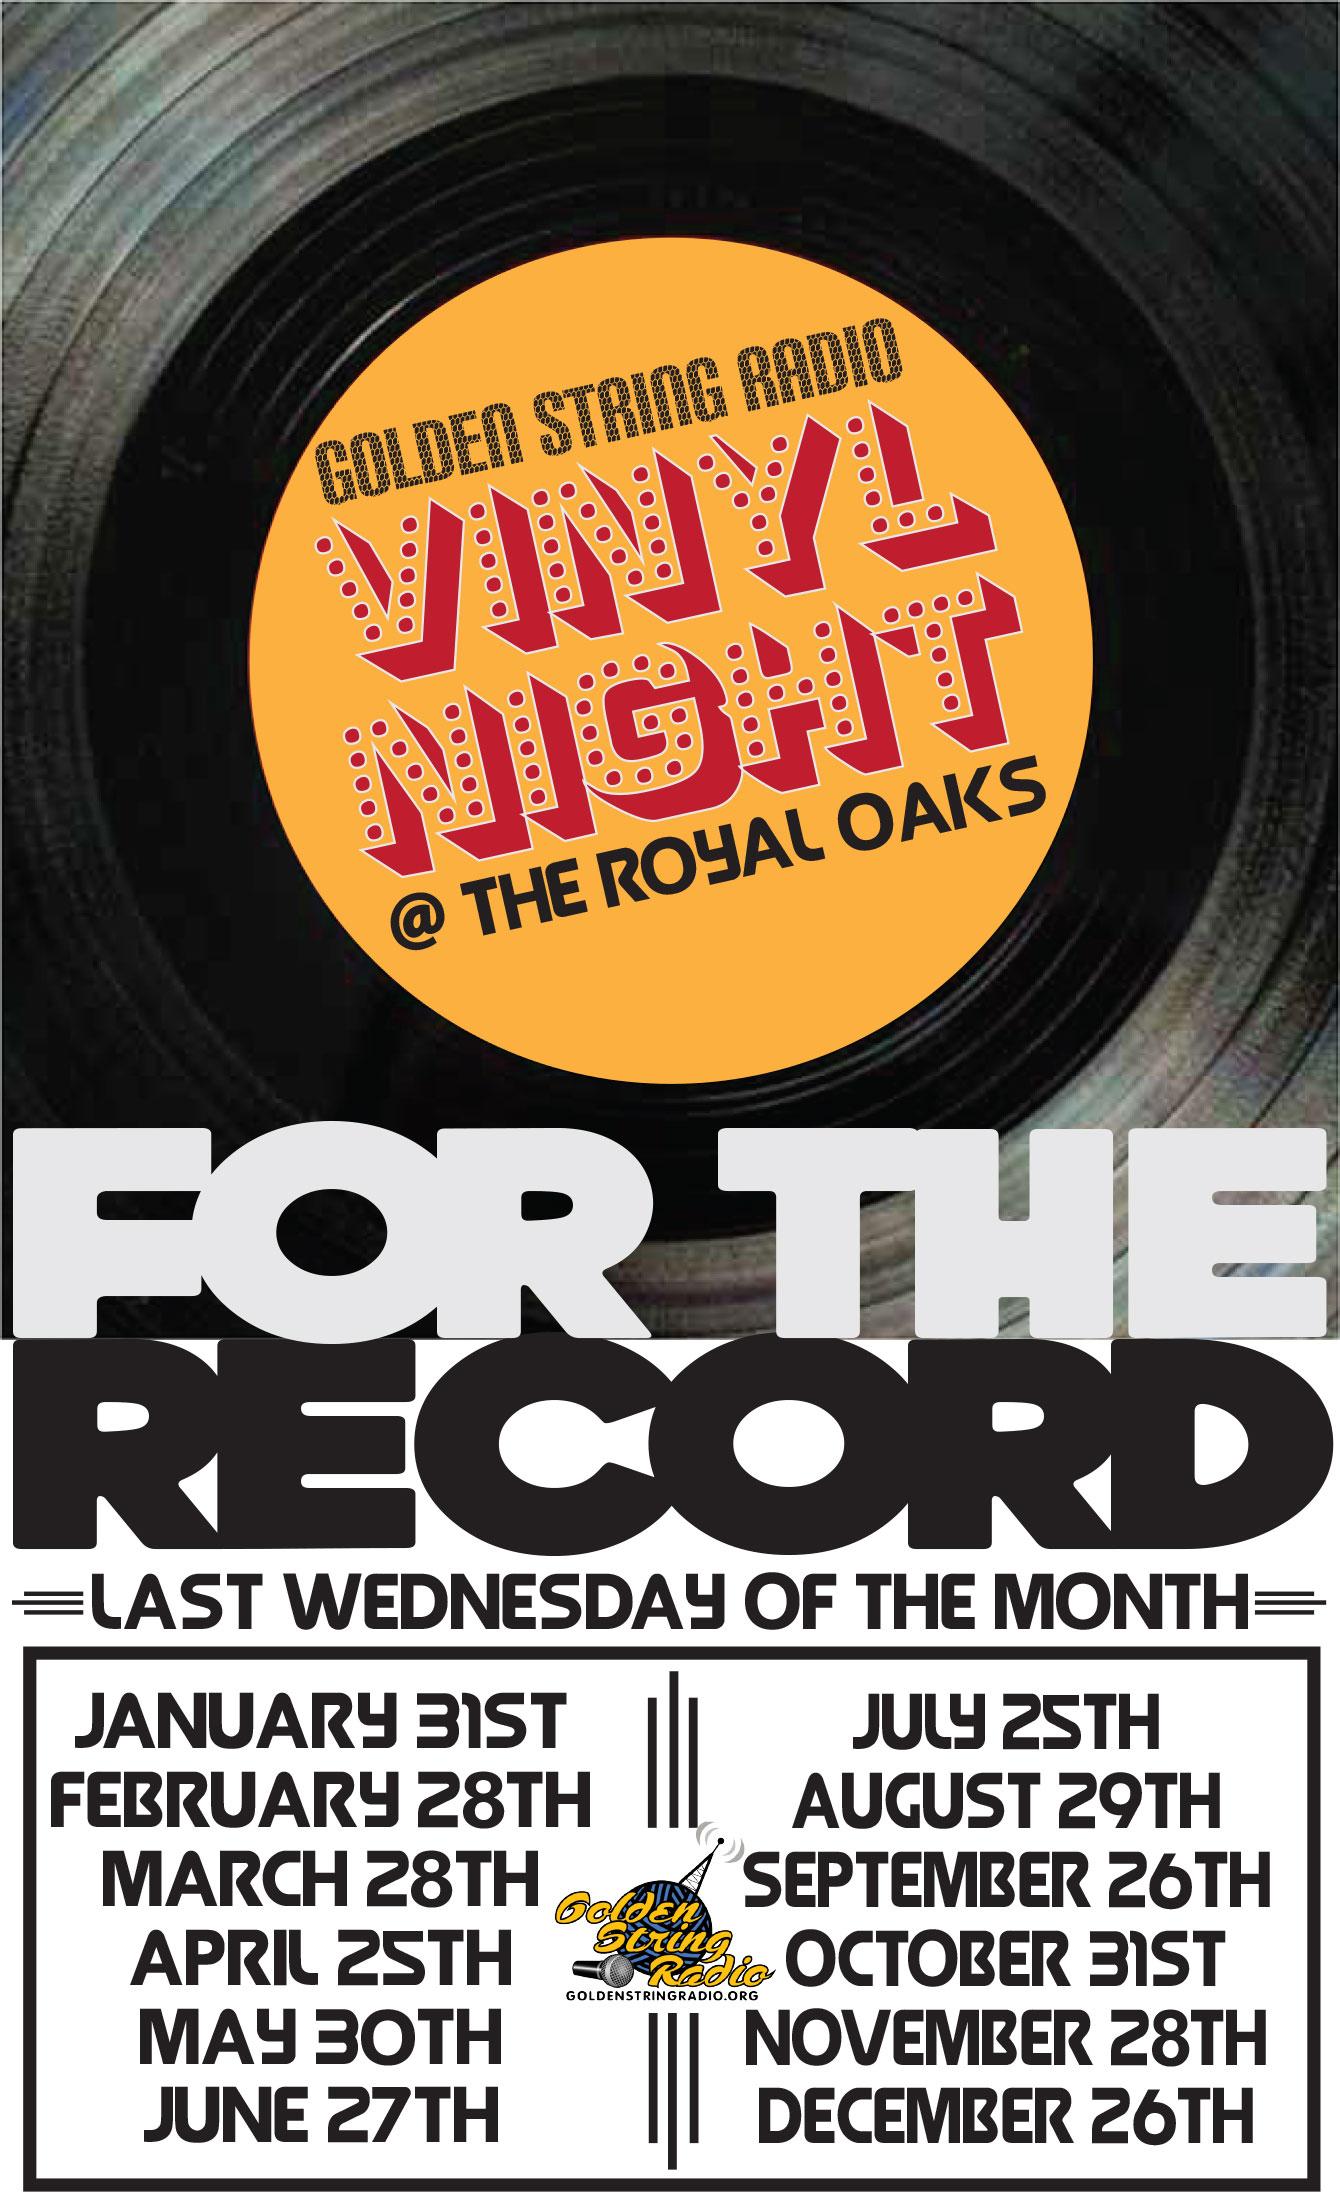 Vinyl Happy Hour at The Royal Oaks